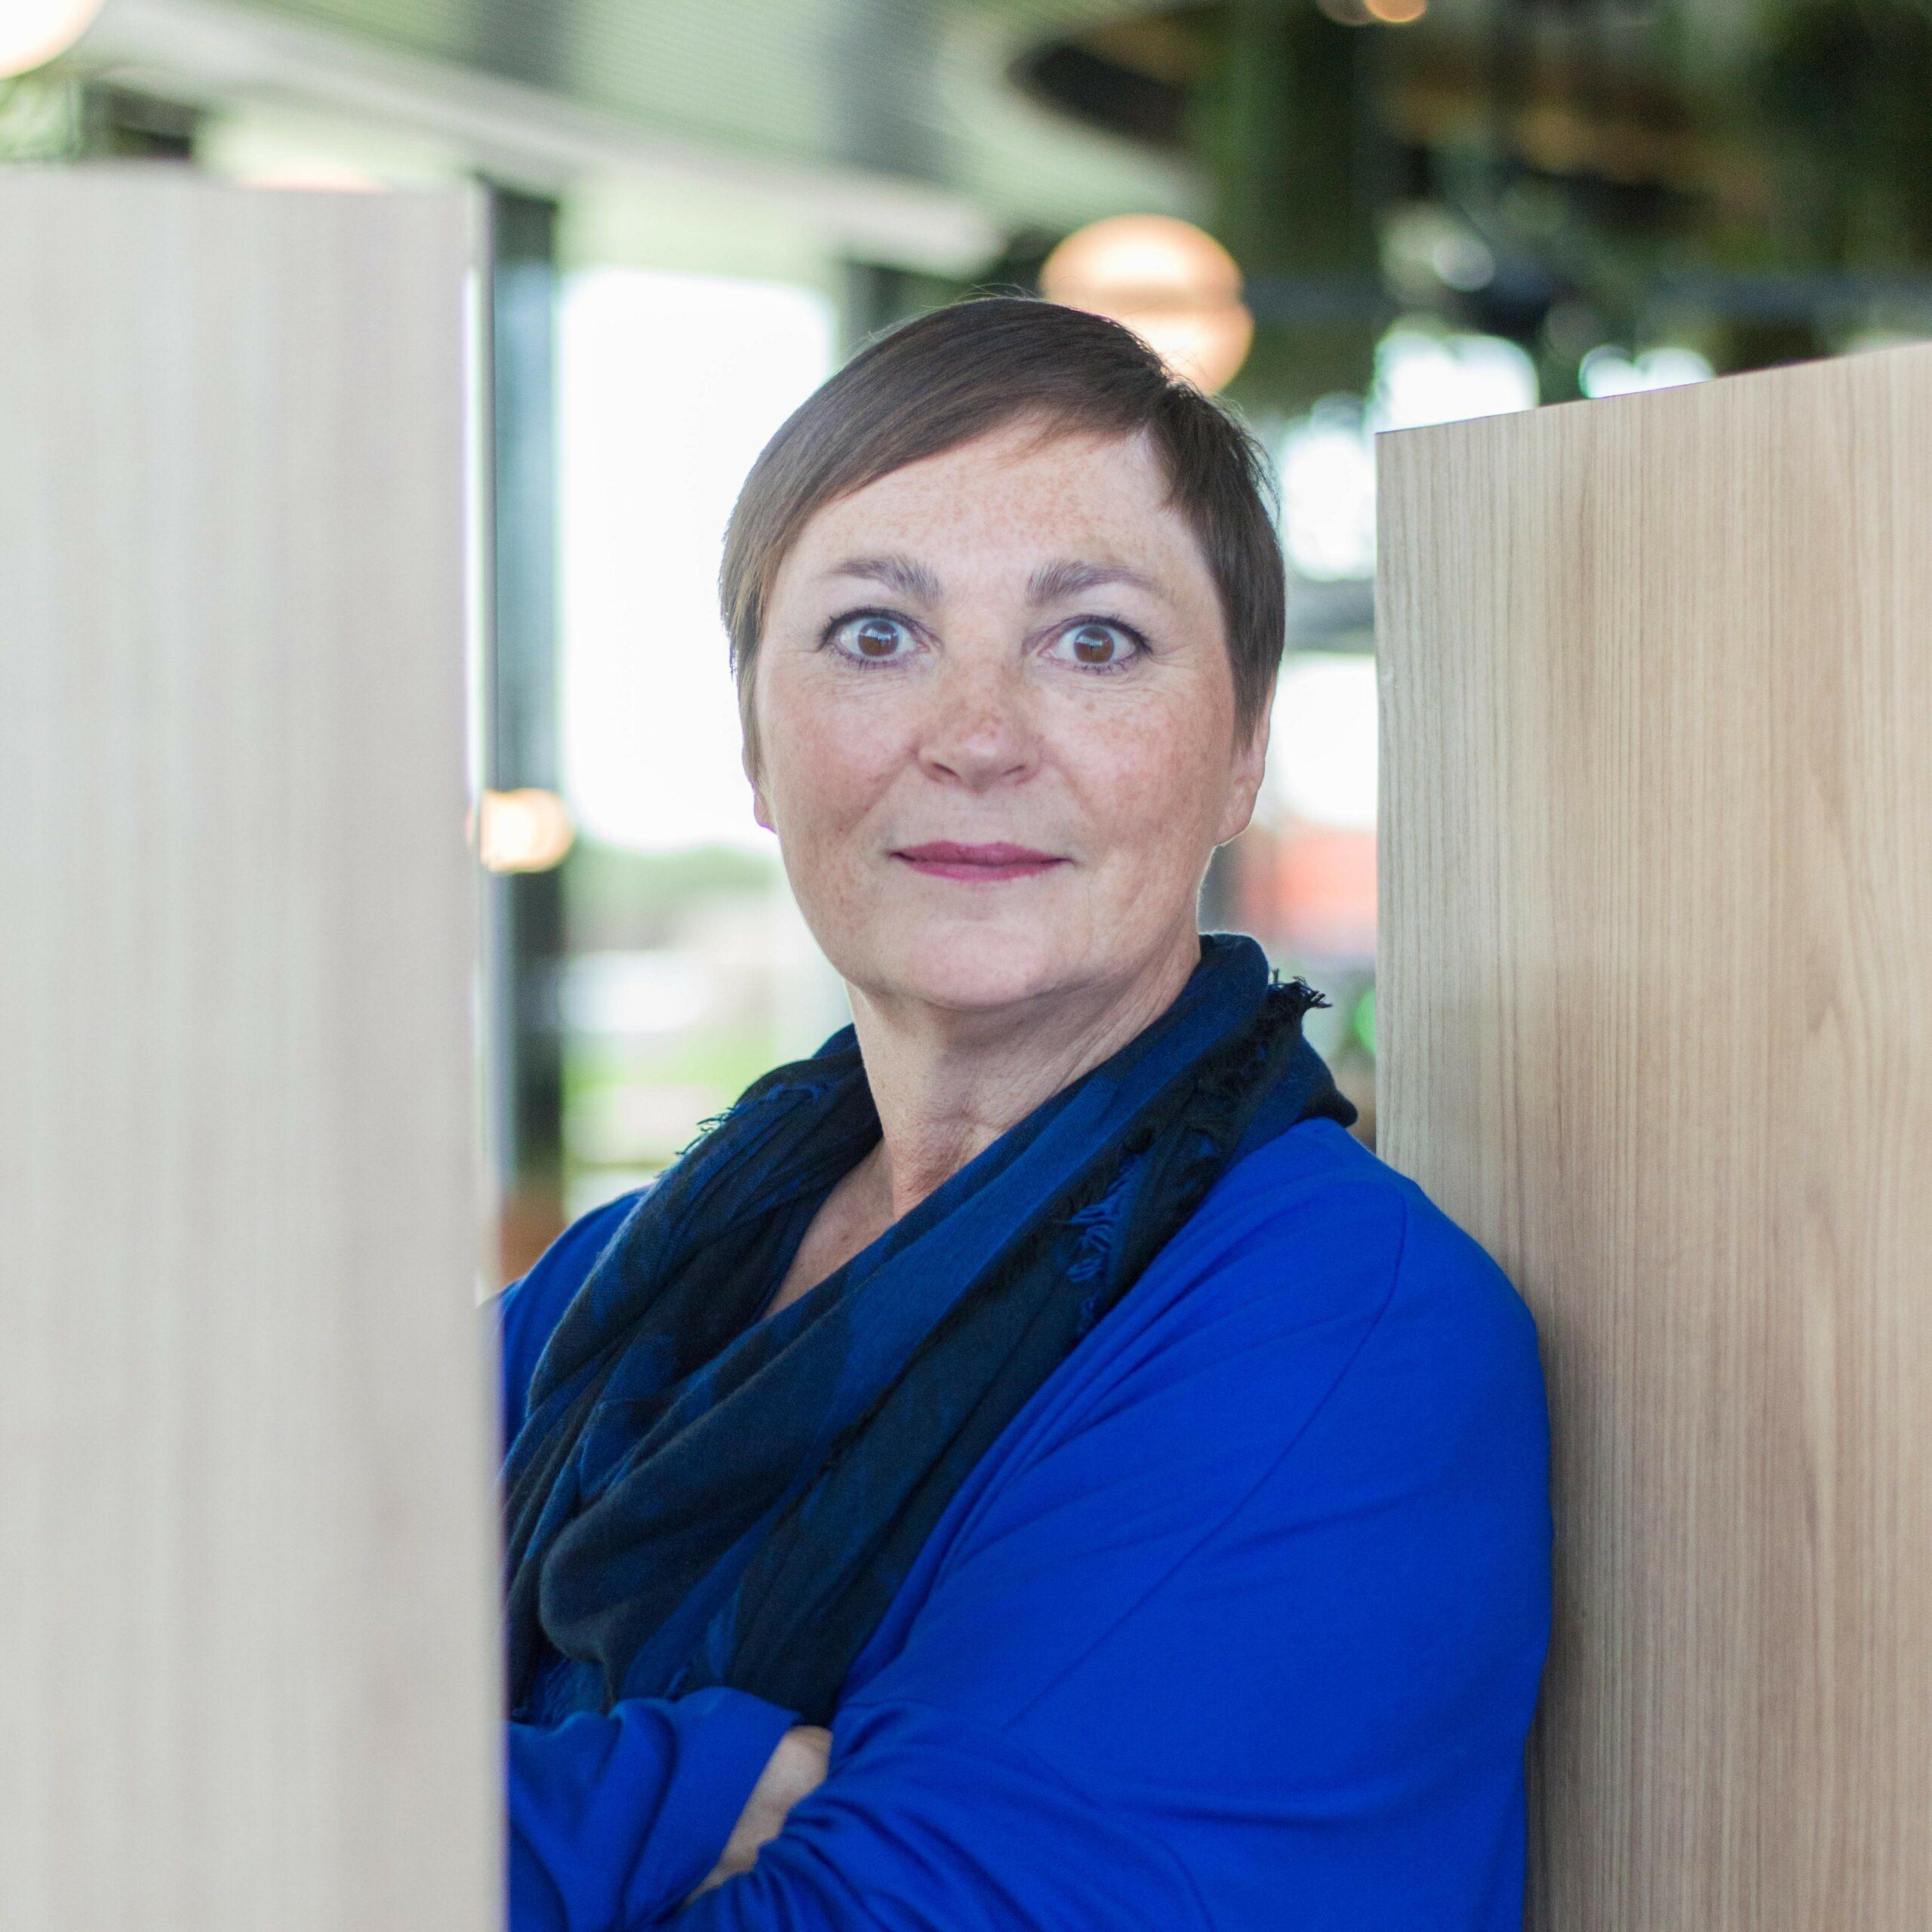 Inge Dries